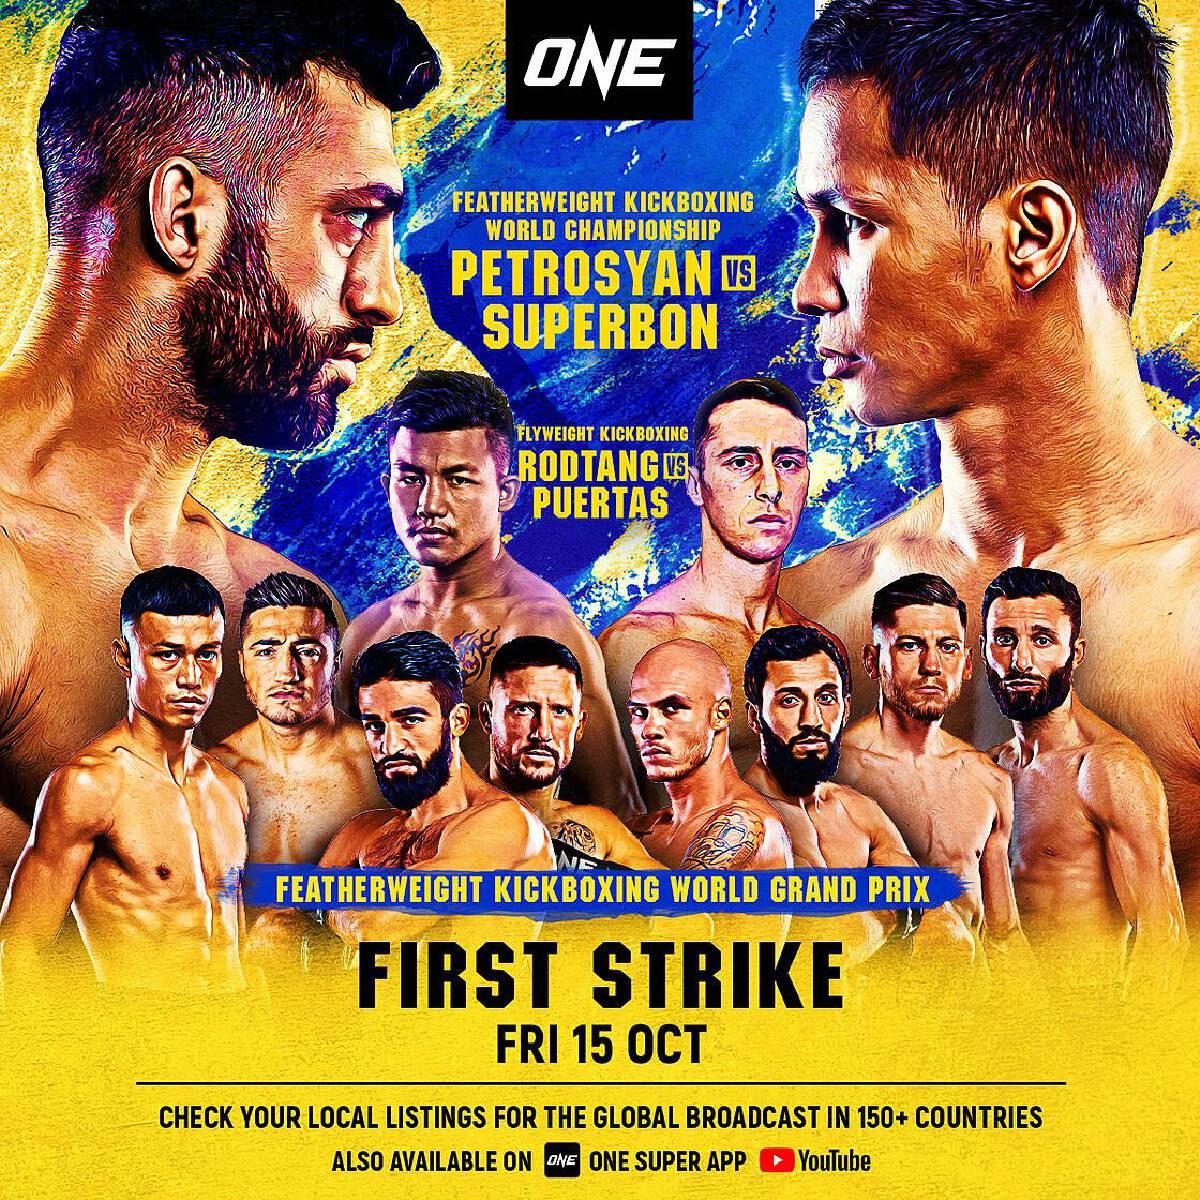 FIRST STRIKE lead card is headlined by an explosive affair between Muay Thai superstars Saemapetch Fairtex and Tawanchai PK.Saenchai Muaythaigym.